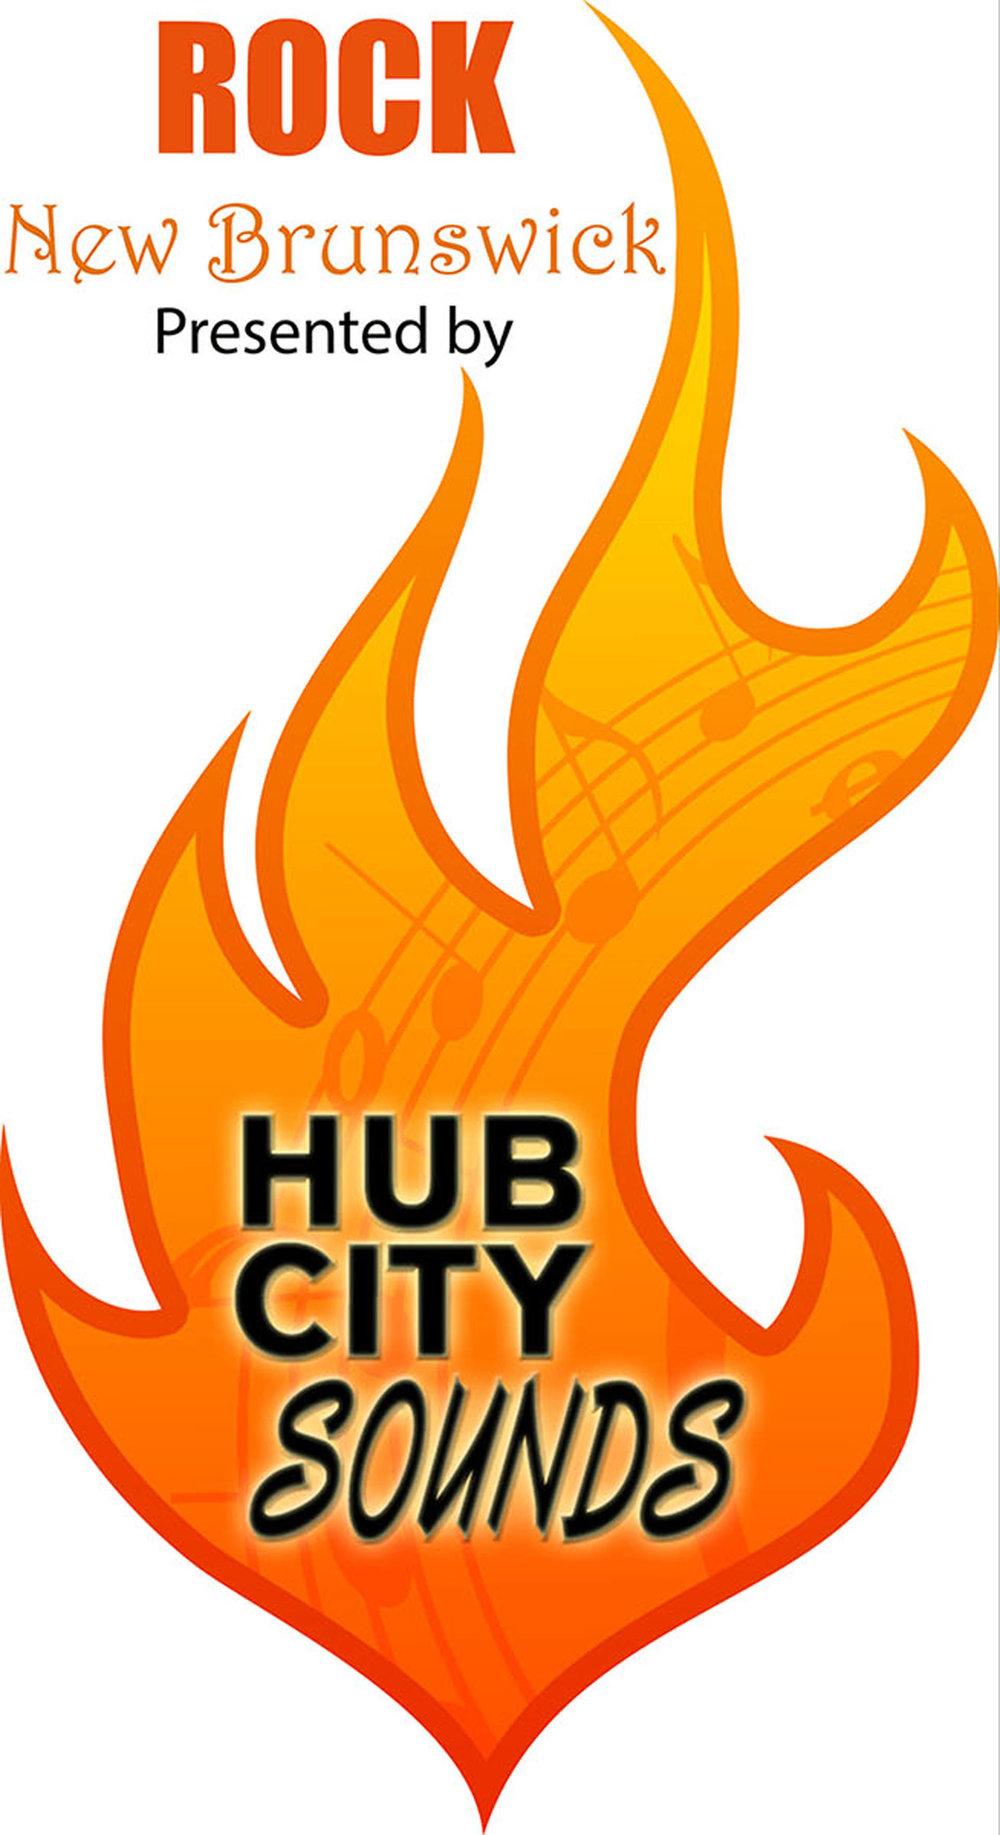 ROCK New Brunswick Presented by Hub City Sounds.jpg